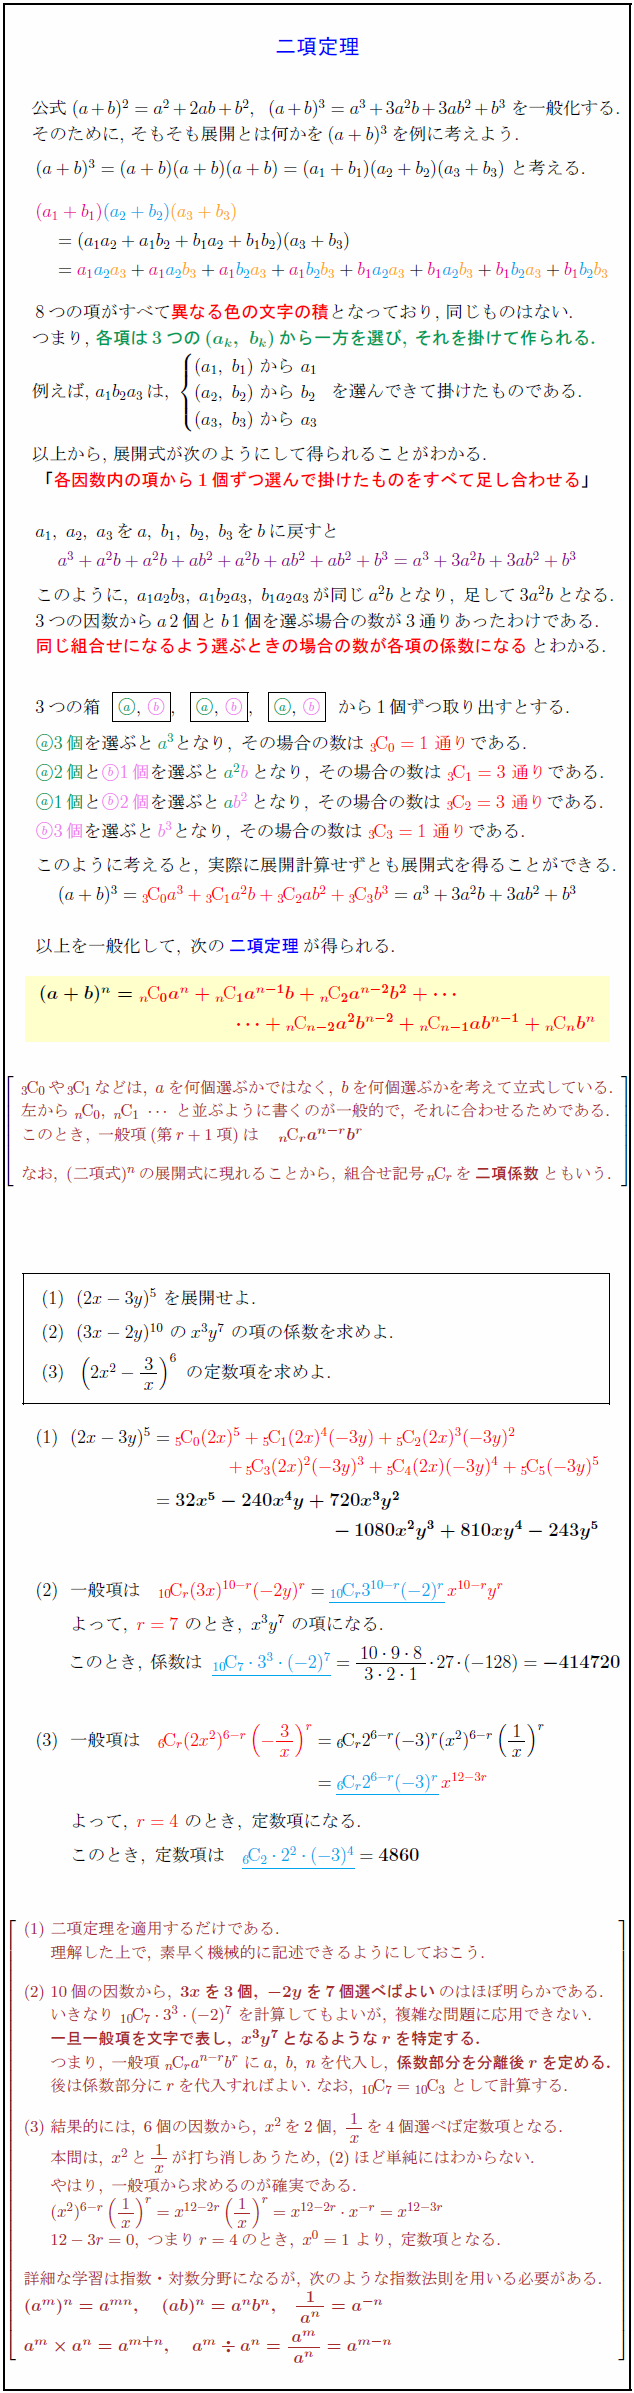 binomial-theorem